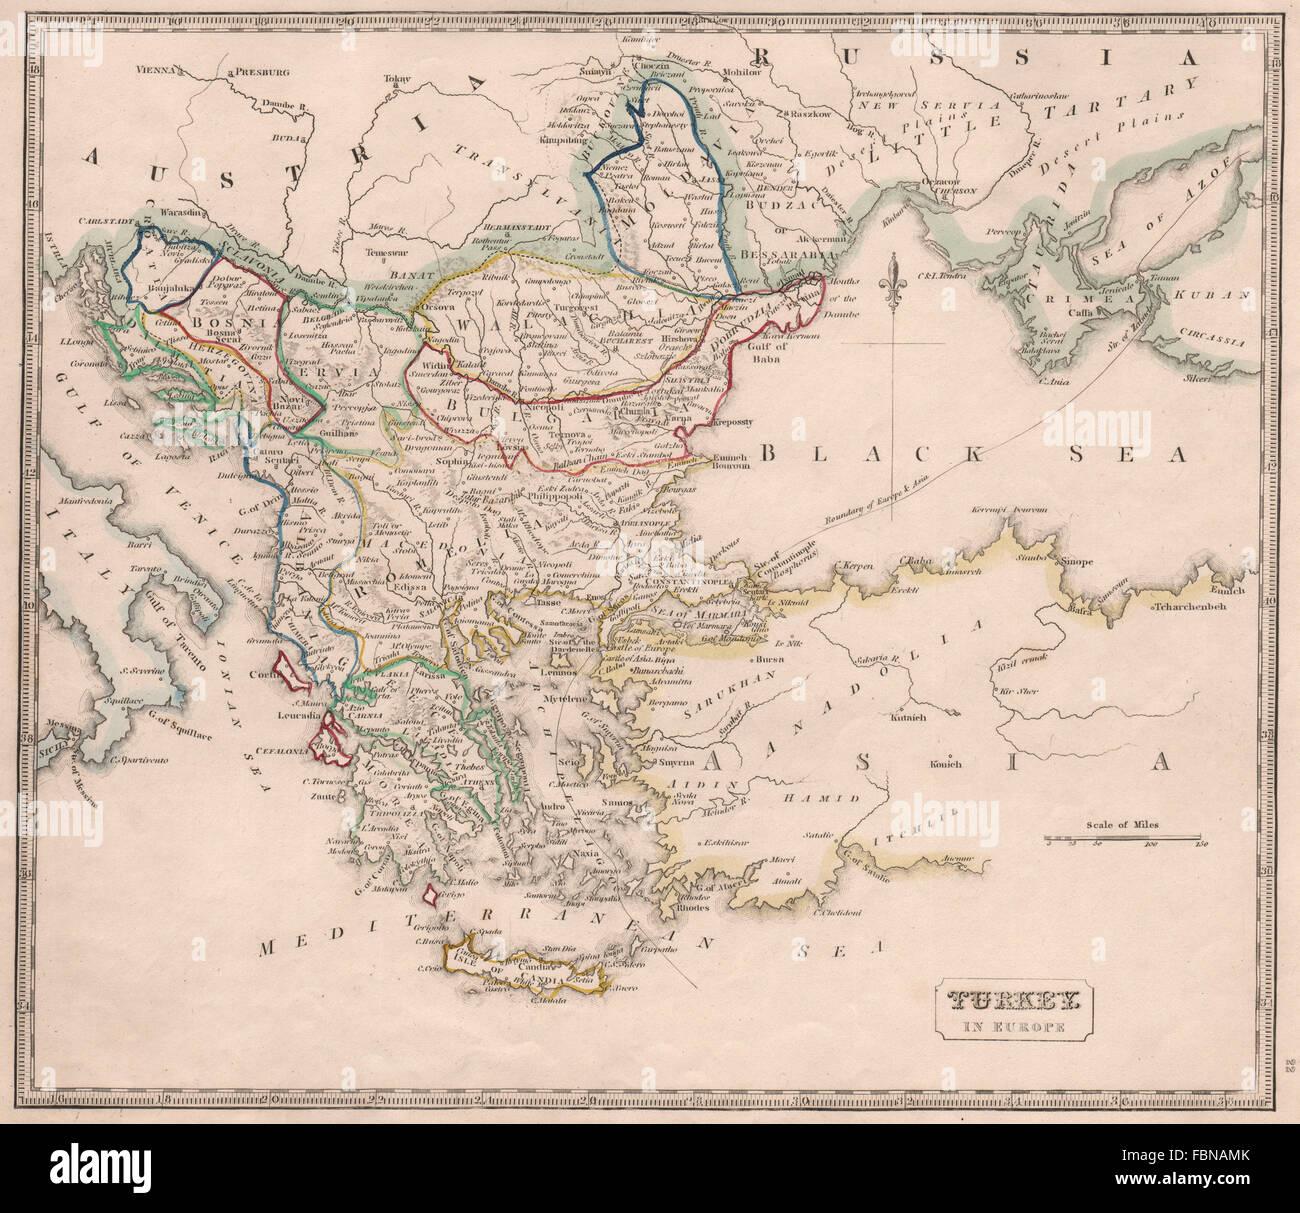 TURKEY IN EUROPE. Balkans. British Ionian Islands. Romelia ...